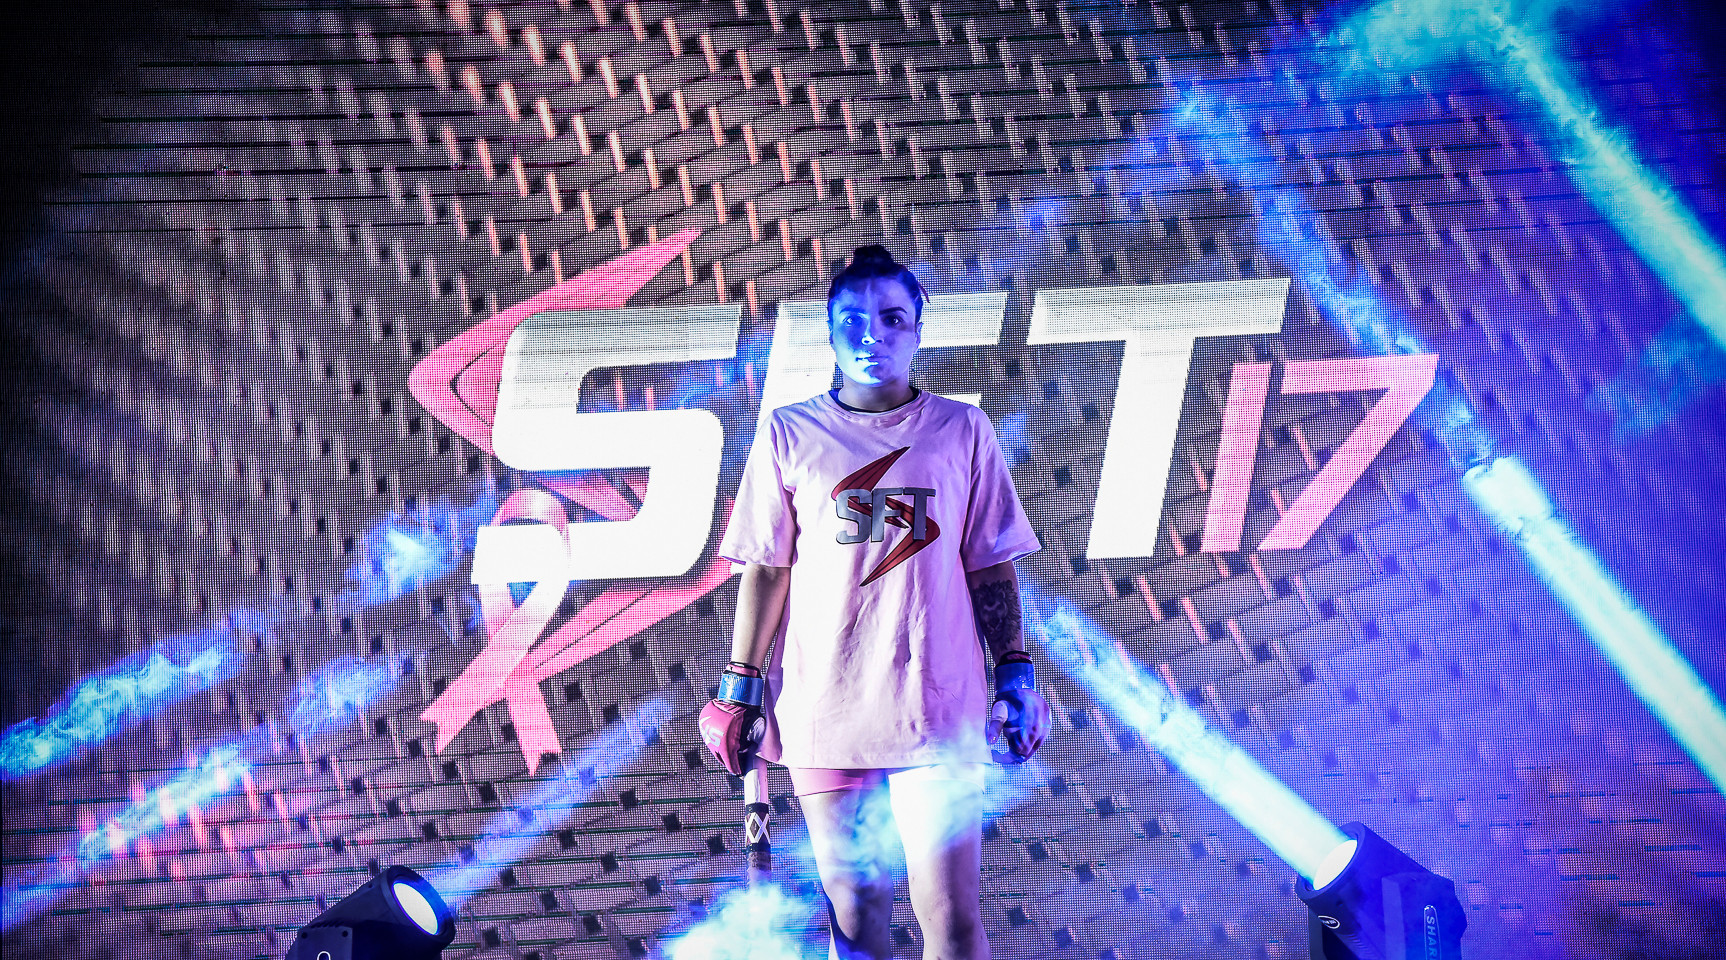 SFT17_Luta04-1.jpg